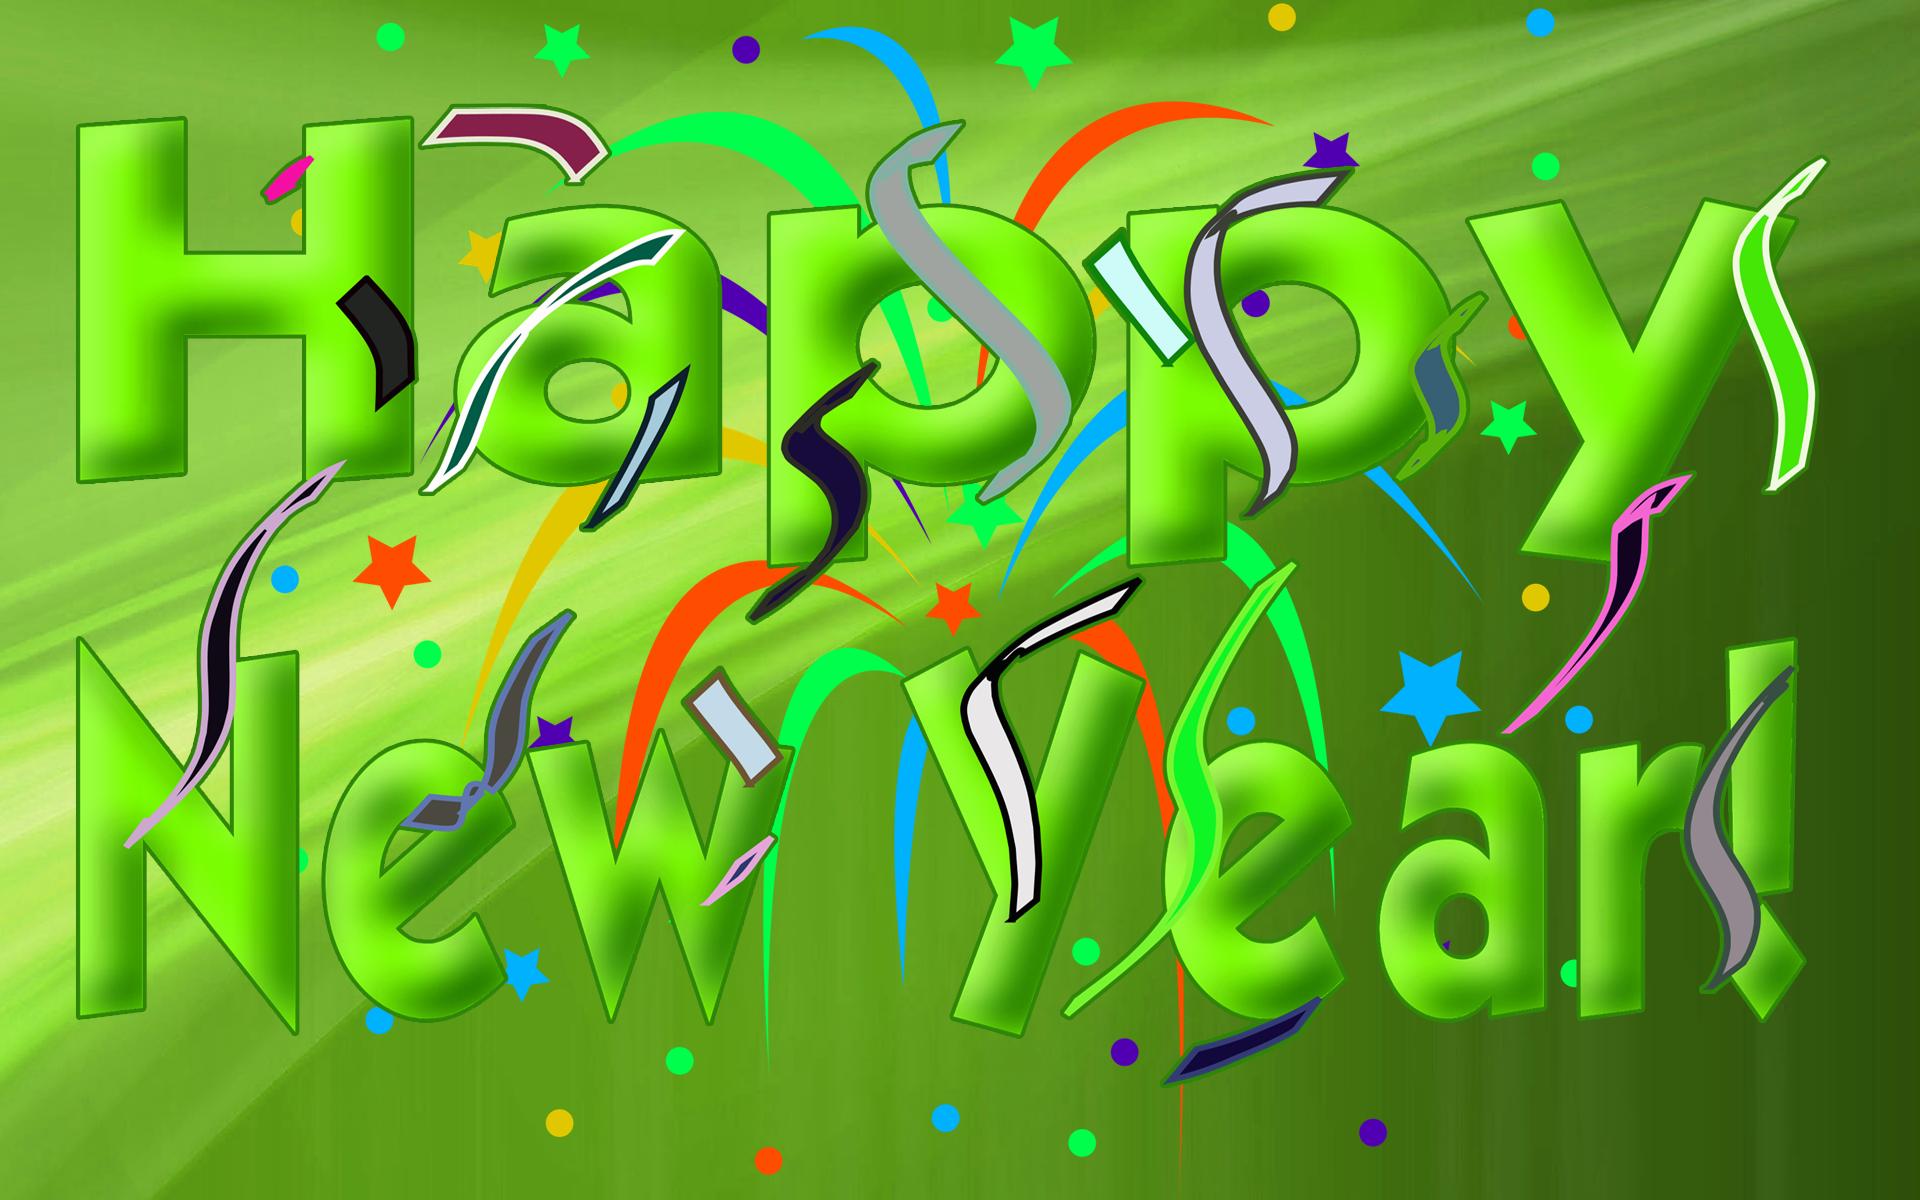 Happy New Year 2015 Wallpaper Desktop 8332 Wallpaper Cool 1920x1200